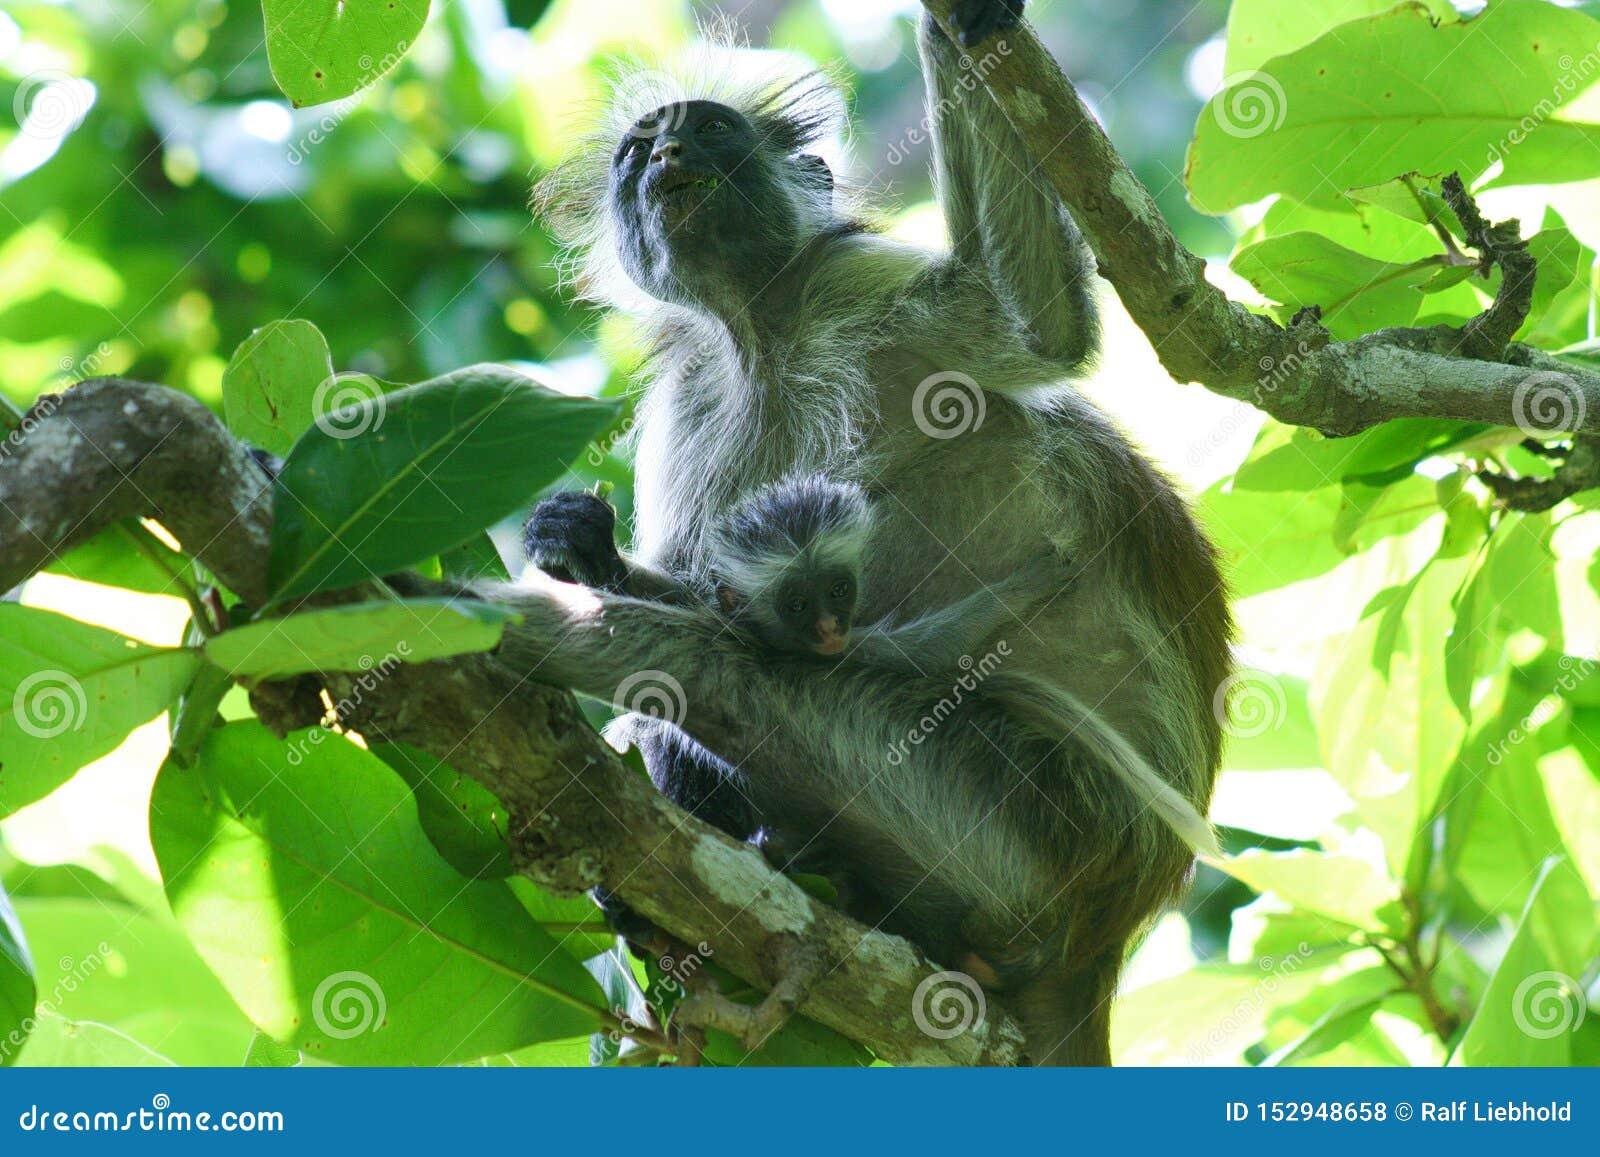 endangered red colobus monkey Piliocolobus, Procolobus kirkii mother with baby in the trees of Jozani Forest, Zanzibar